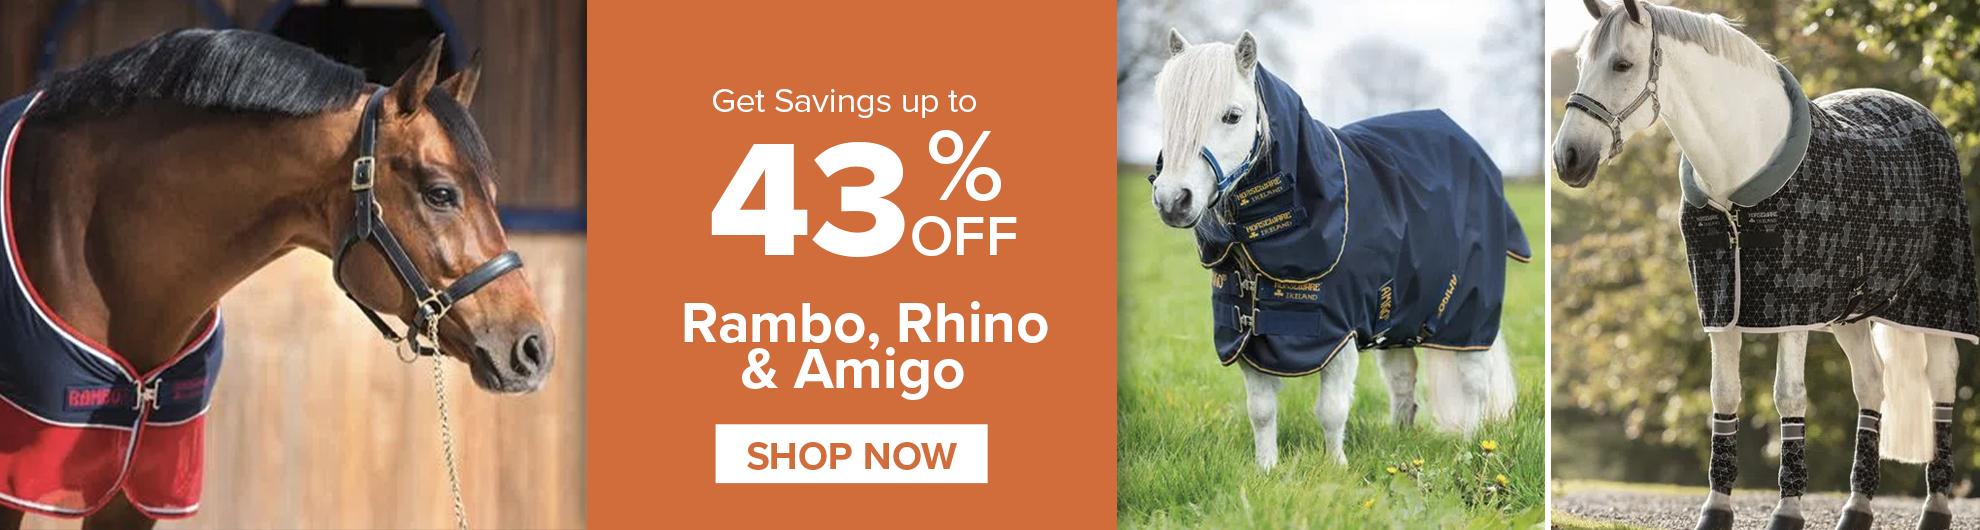 Rambo, Rhino, Amigo on Sale